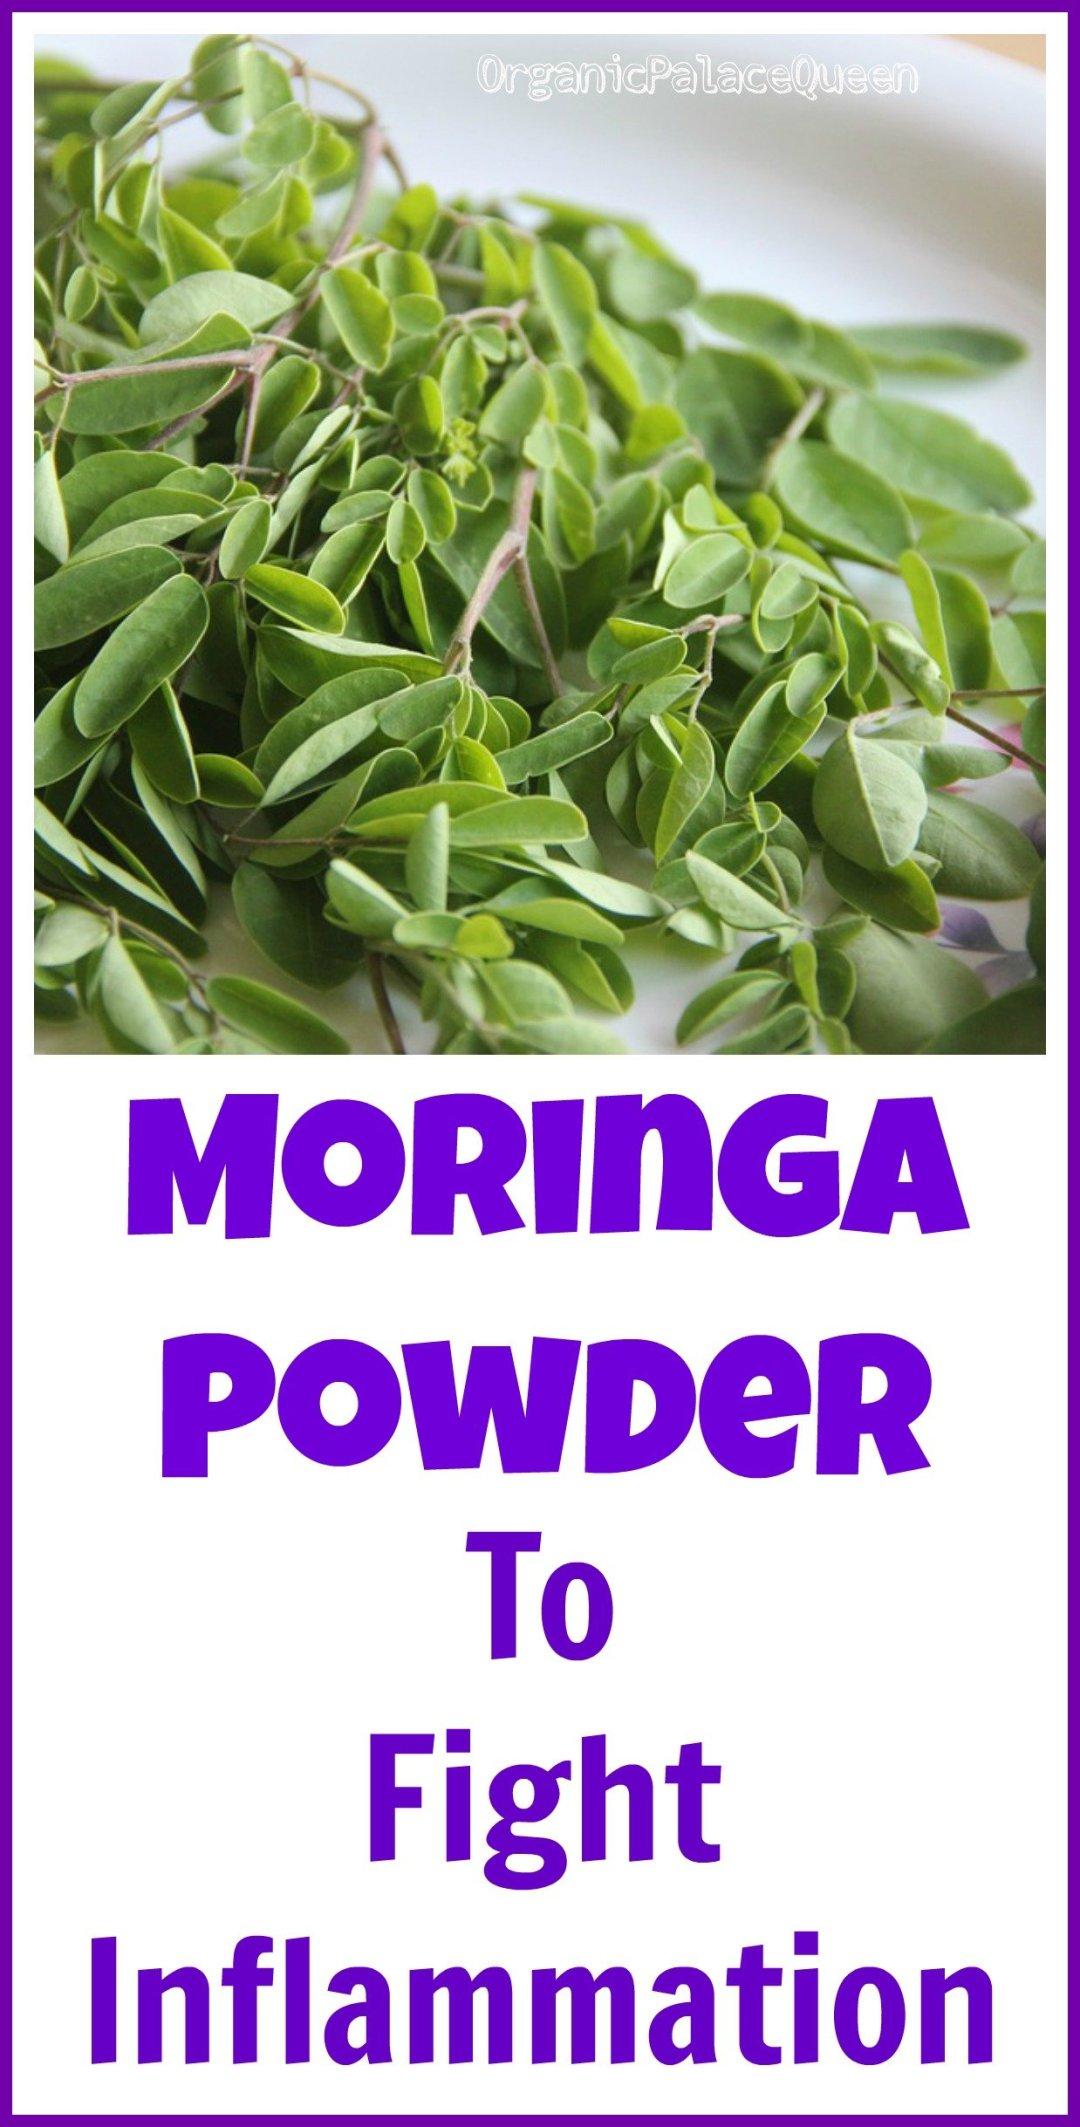 Can moringa powder help inflammation